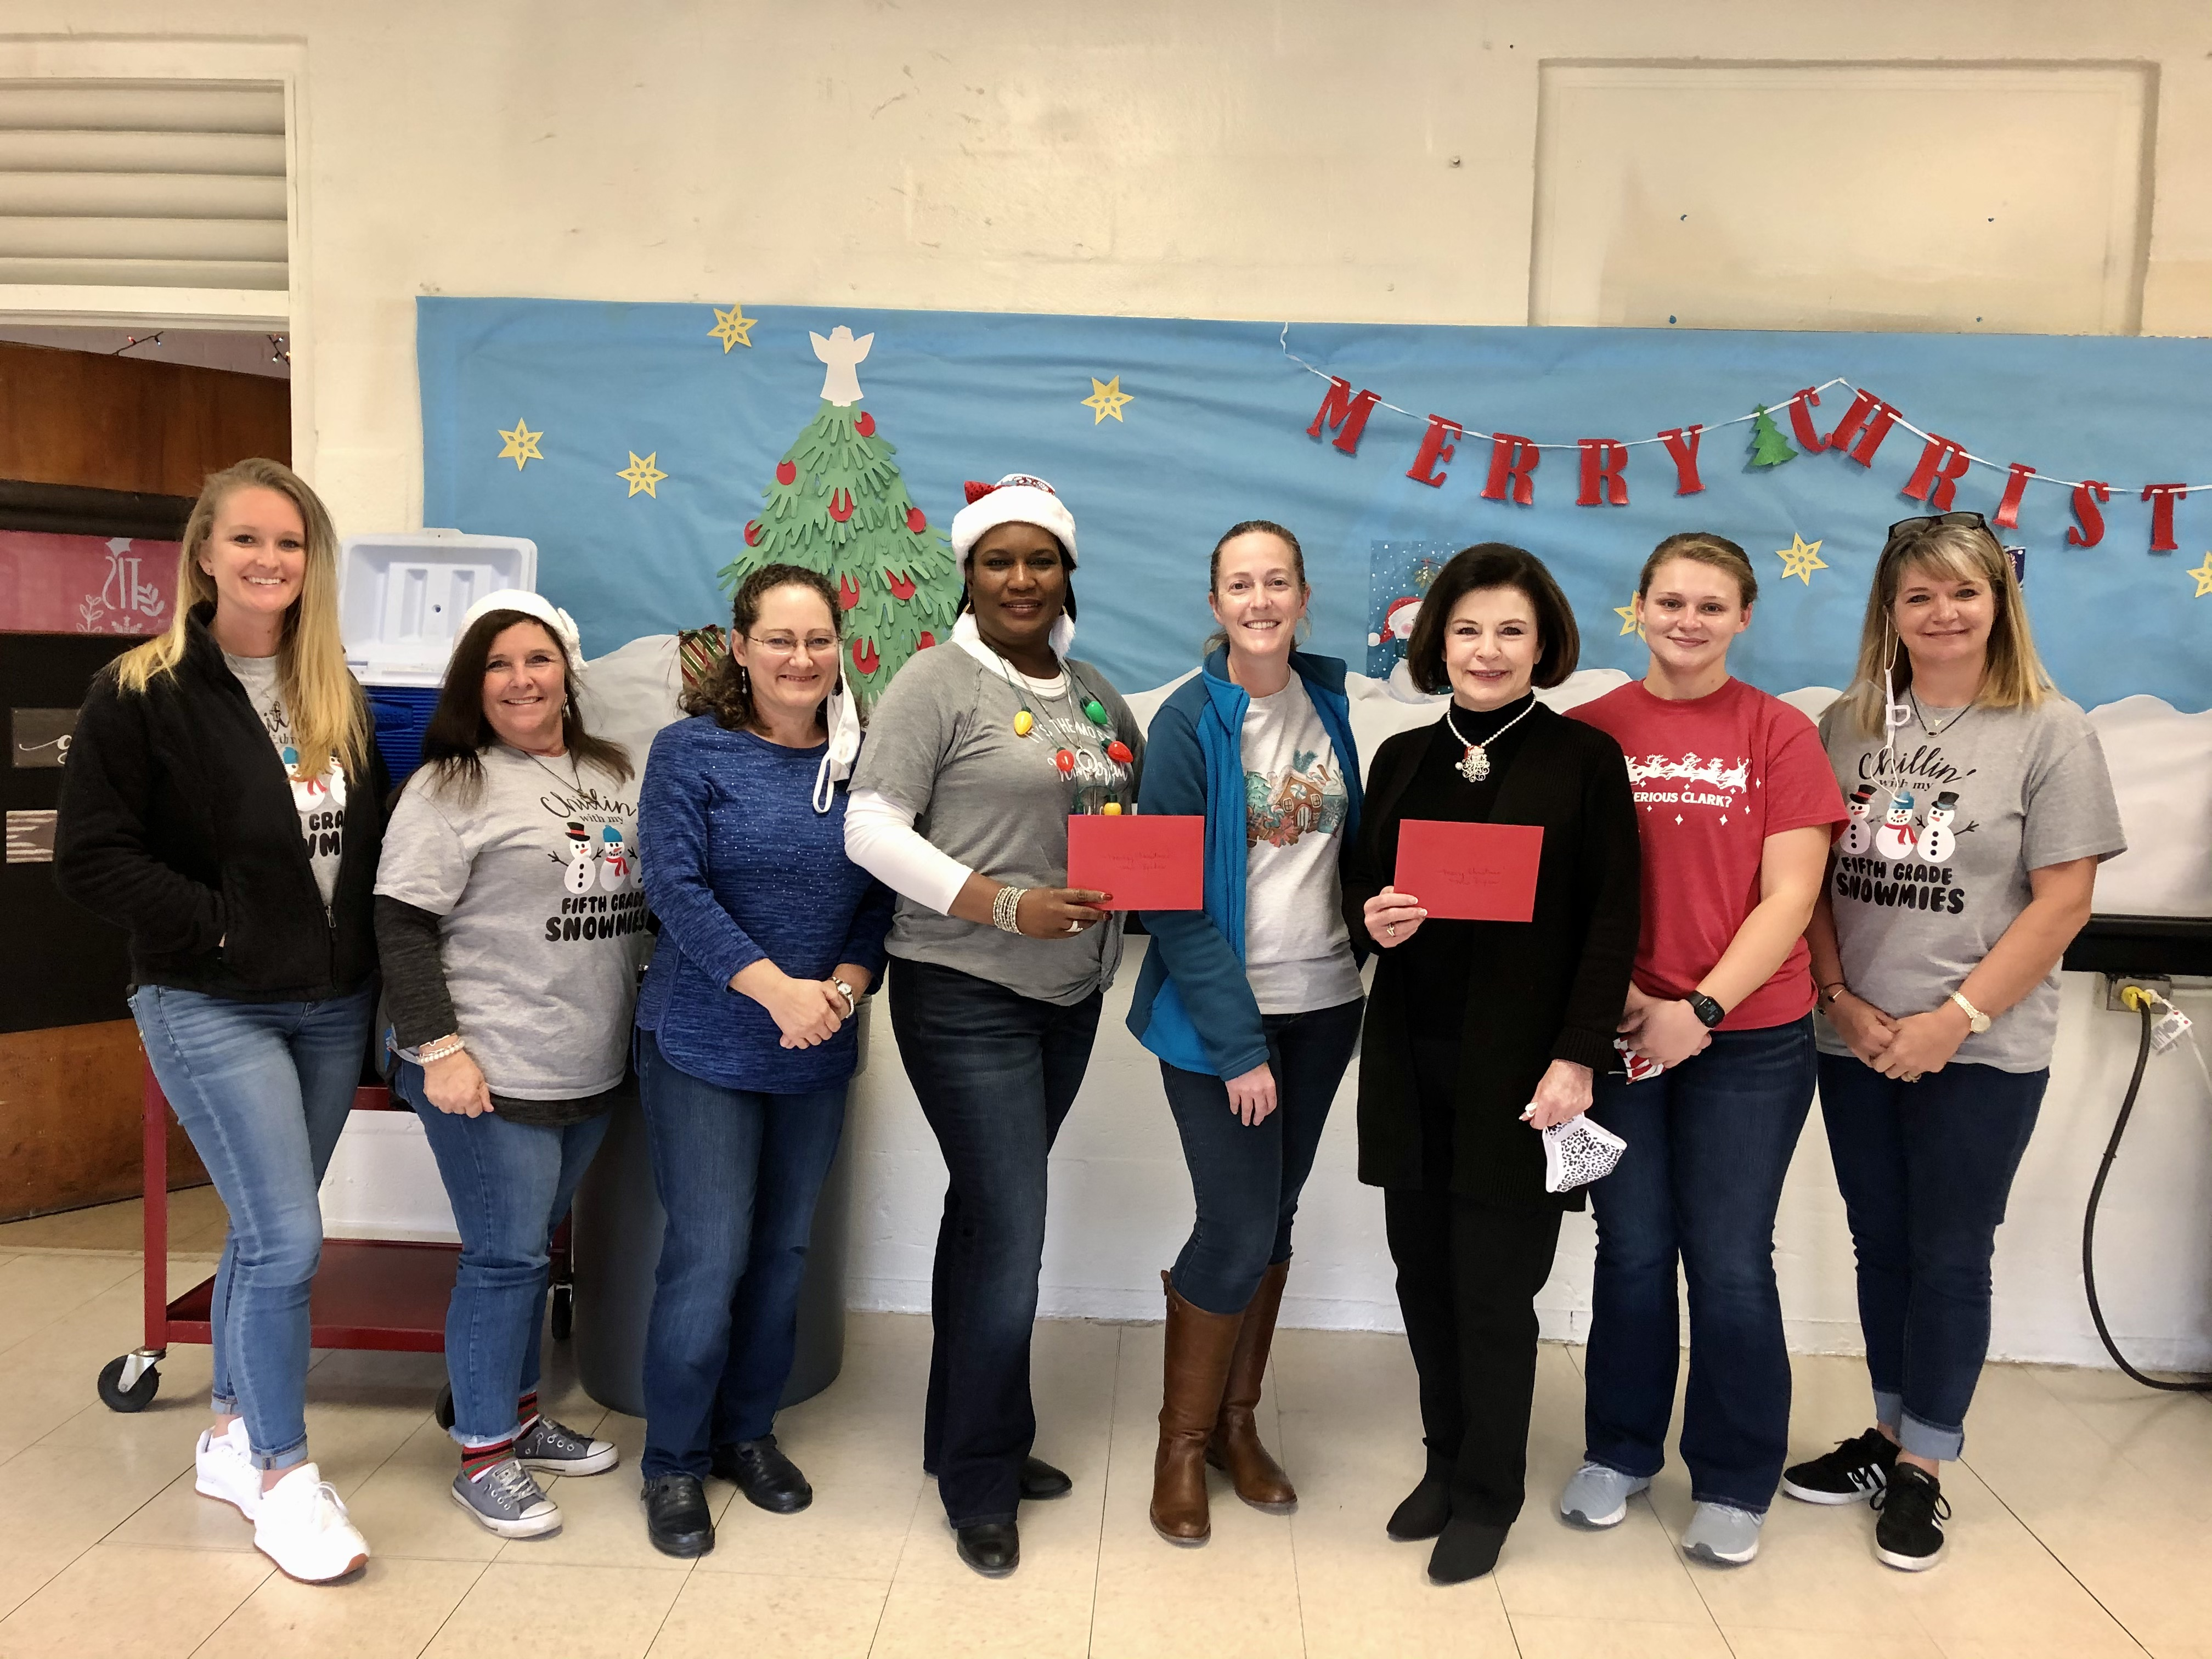 Mrs. Lauing, Mrs. Alston, Mrs. Sonnier, Mrs. Spikes, Nurse Primeaux, Mrs. Dixon, Miss Brown, Mrs. Shirley